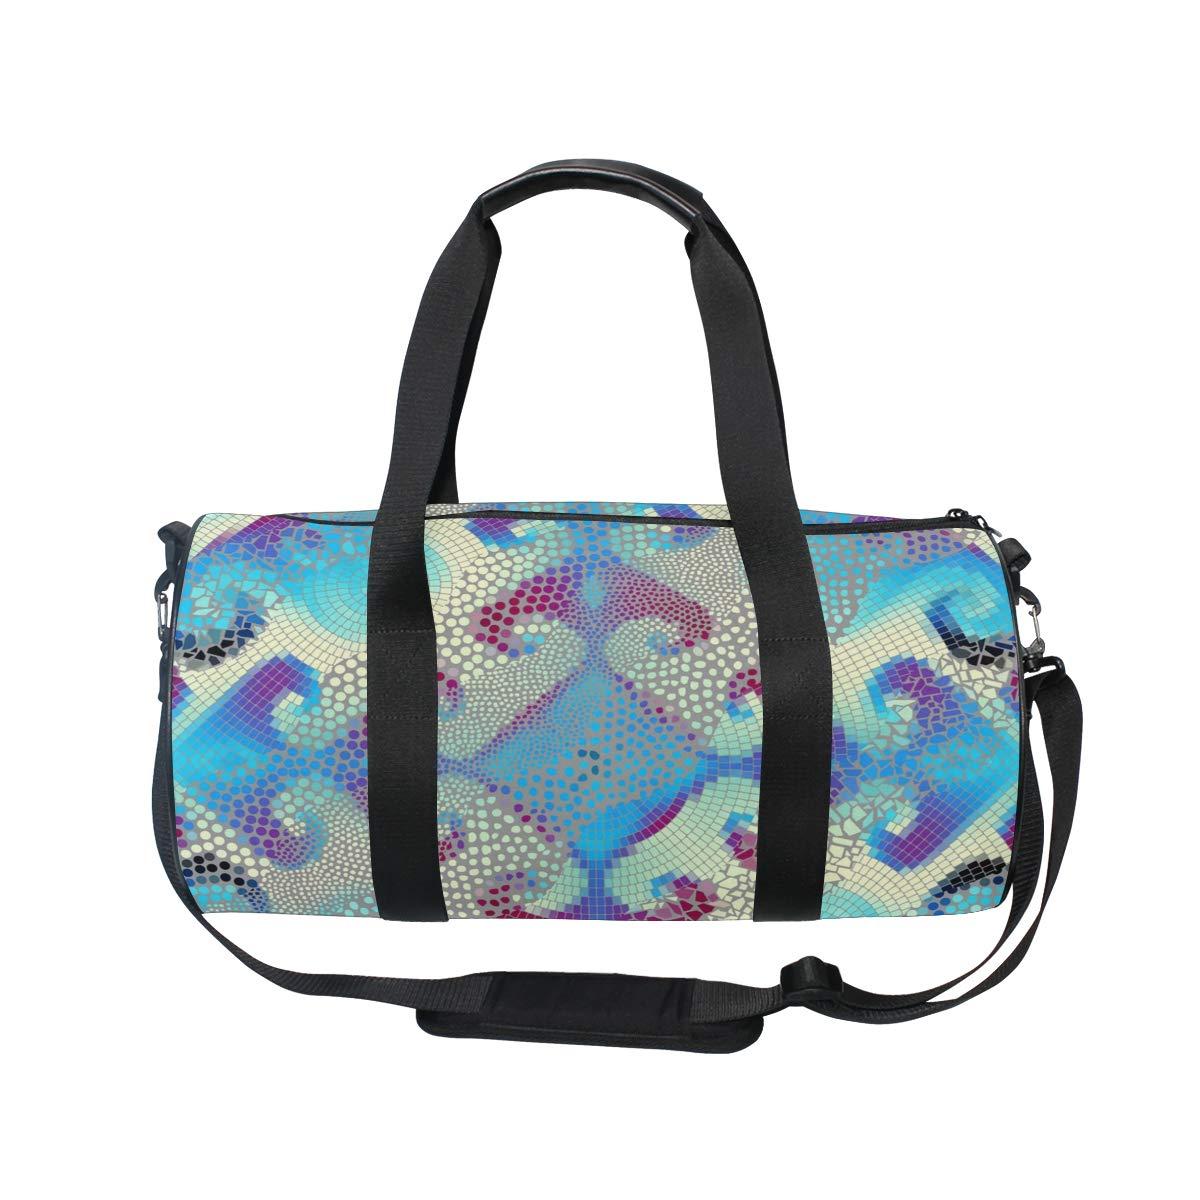 Psychedelic Sketch Ceramic PictureWaterproof Non-Slip Wearable Crossbody Bag fitness bag Shoulder Bag